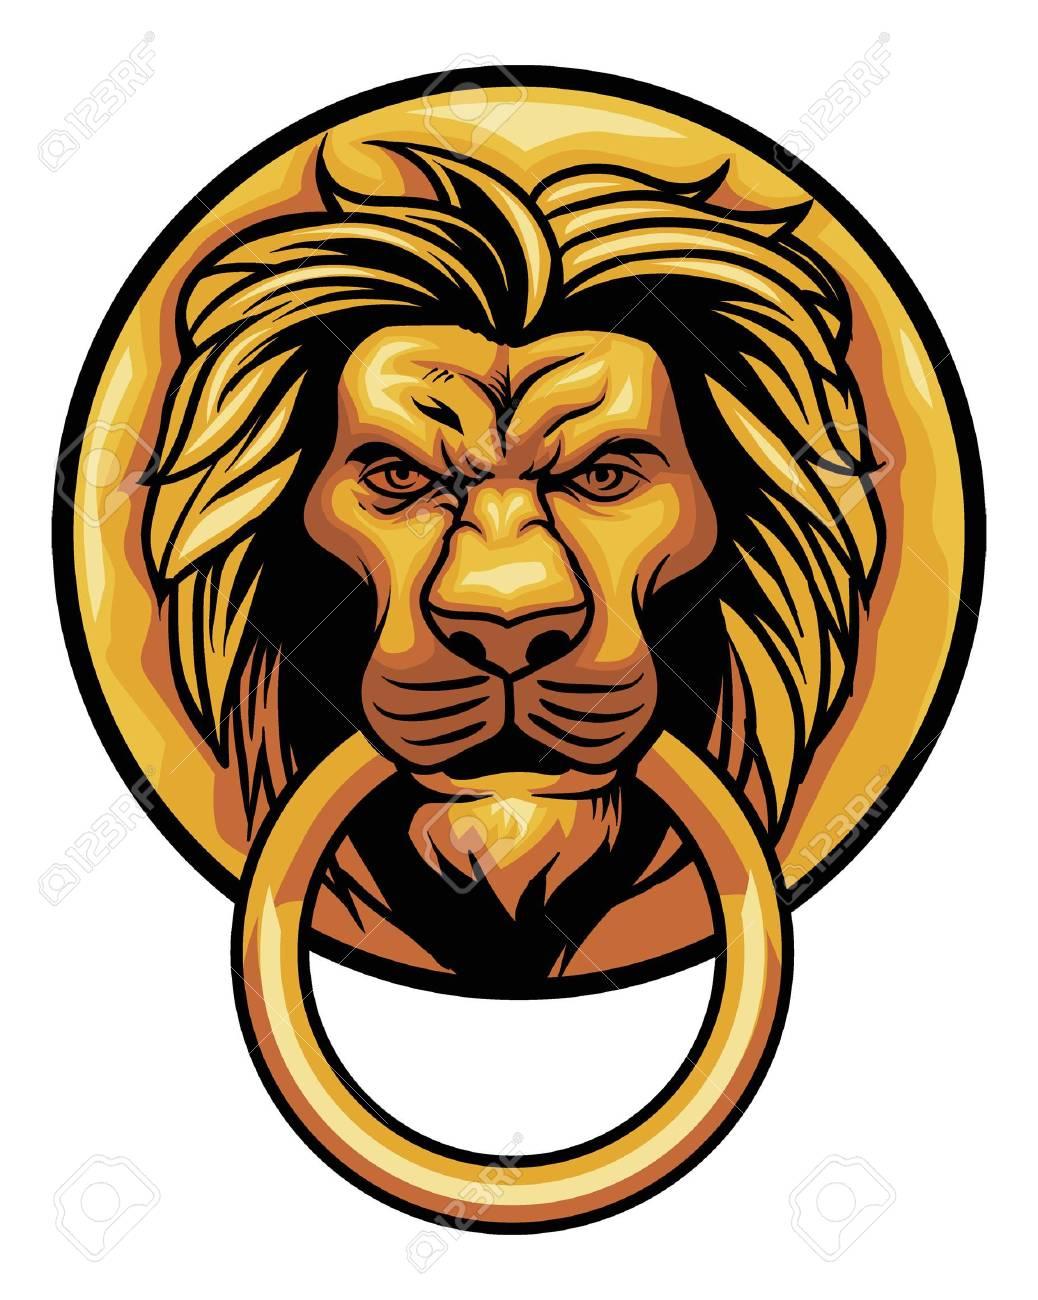 1038x1300 Lion Head Knocker Door Decoration. Royalty Free Cliparts, Vectors